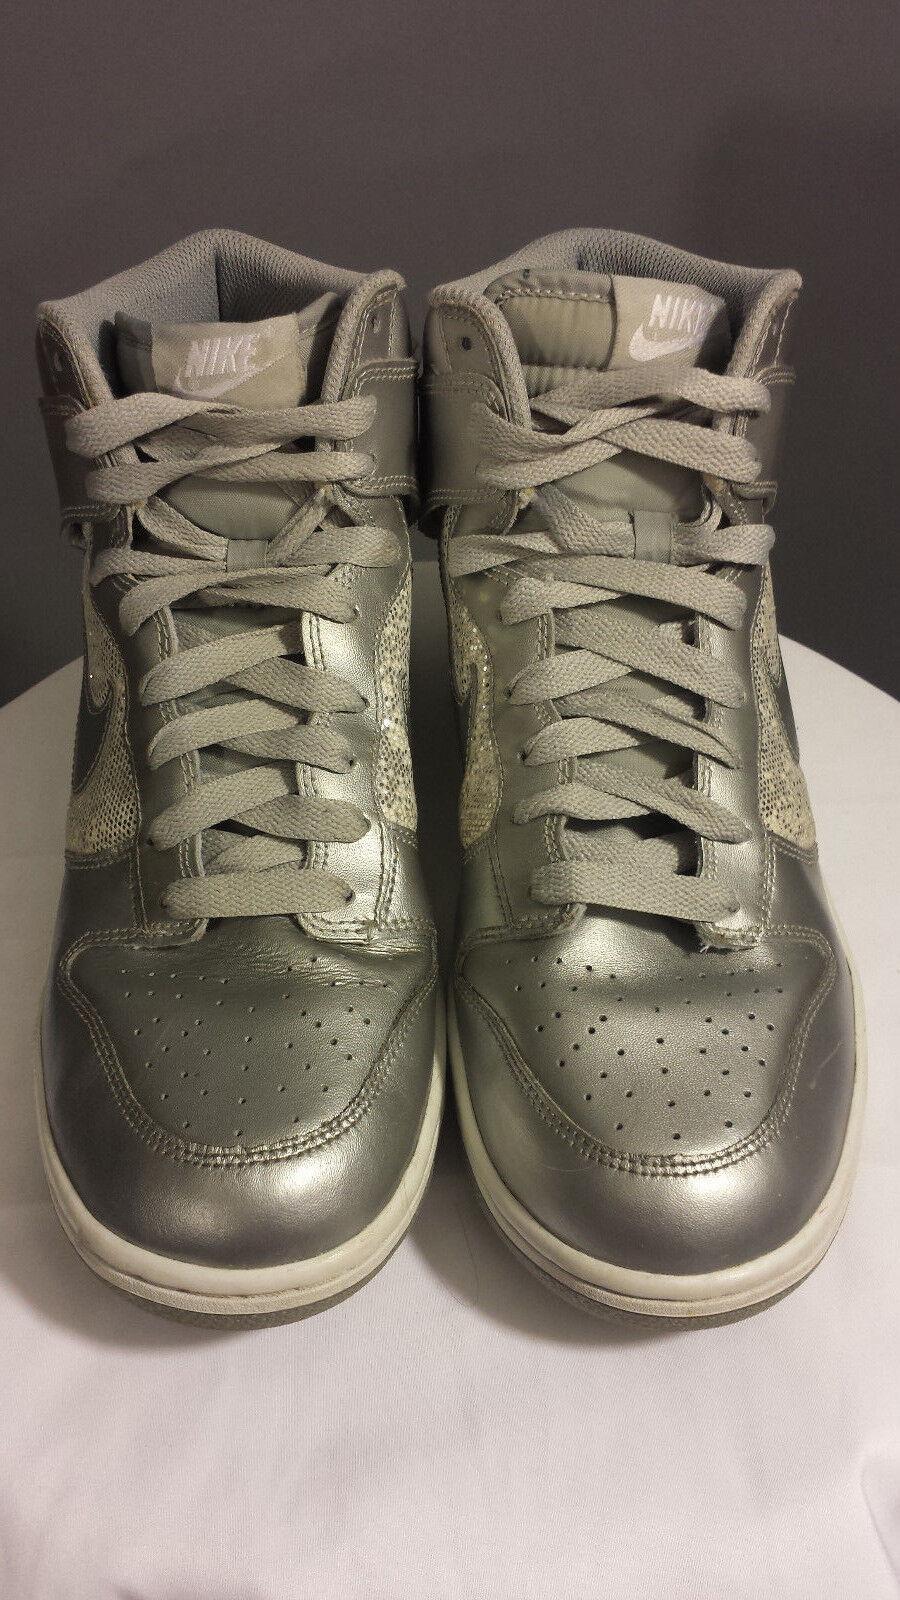 NIKE DUNK HIGH 325203-001 Silver Glitter METALLIC Hi Basketball Shoes WOMEN 10